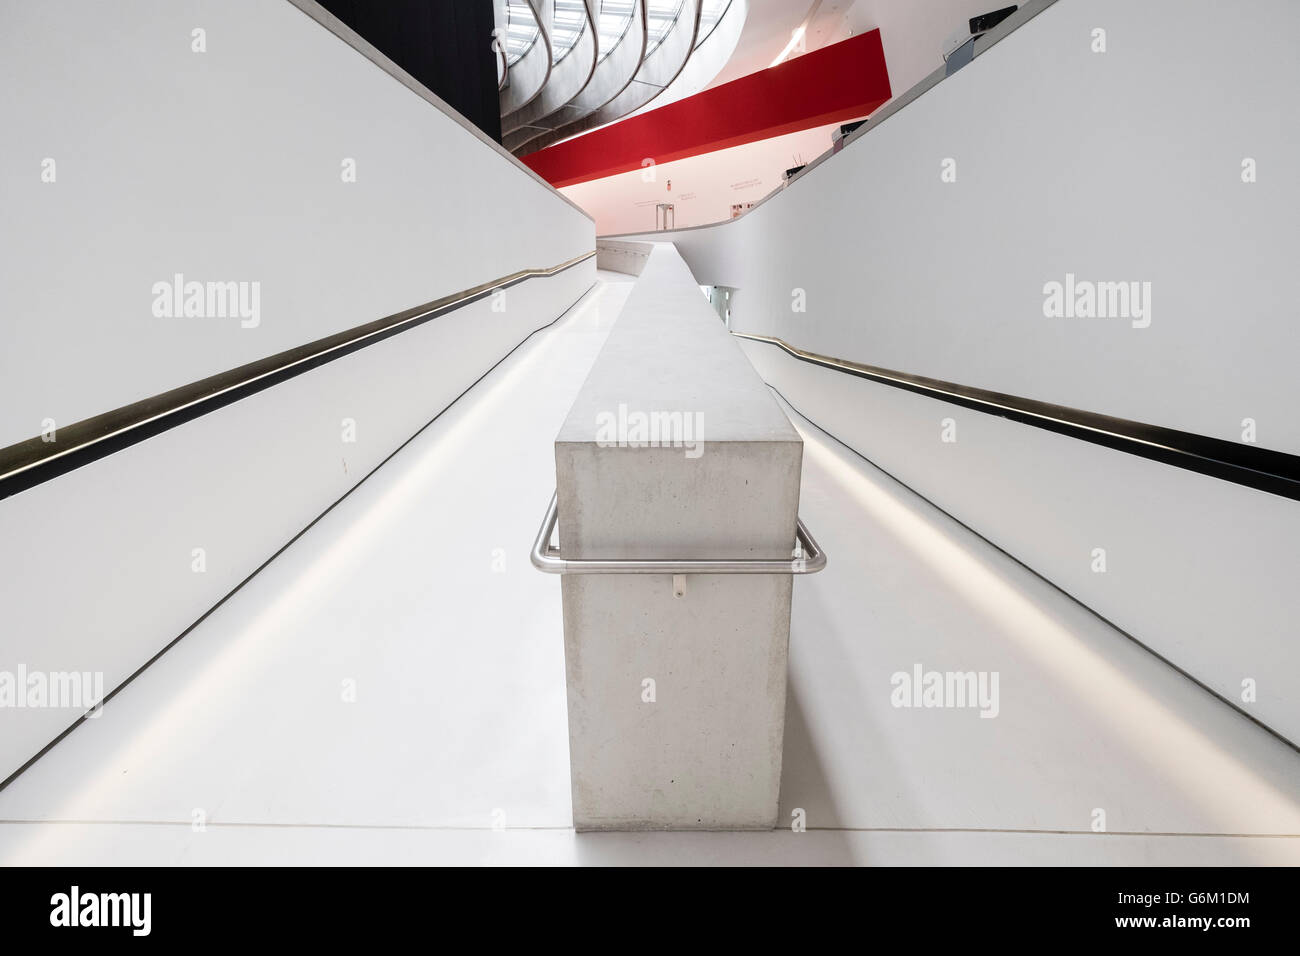 Interior of MAXXI National Centre of Contemporary Arts designed by Zaha Hadid in Rome, Italy Stock Photo